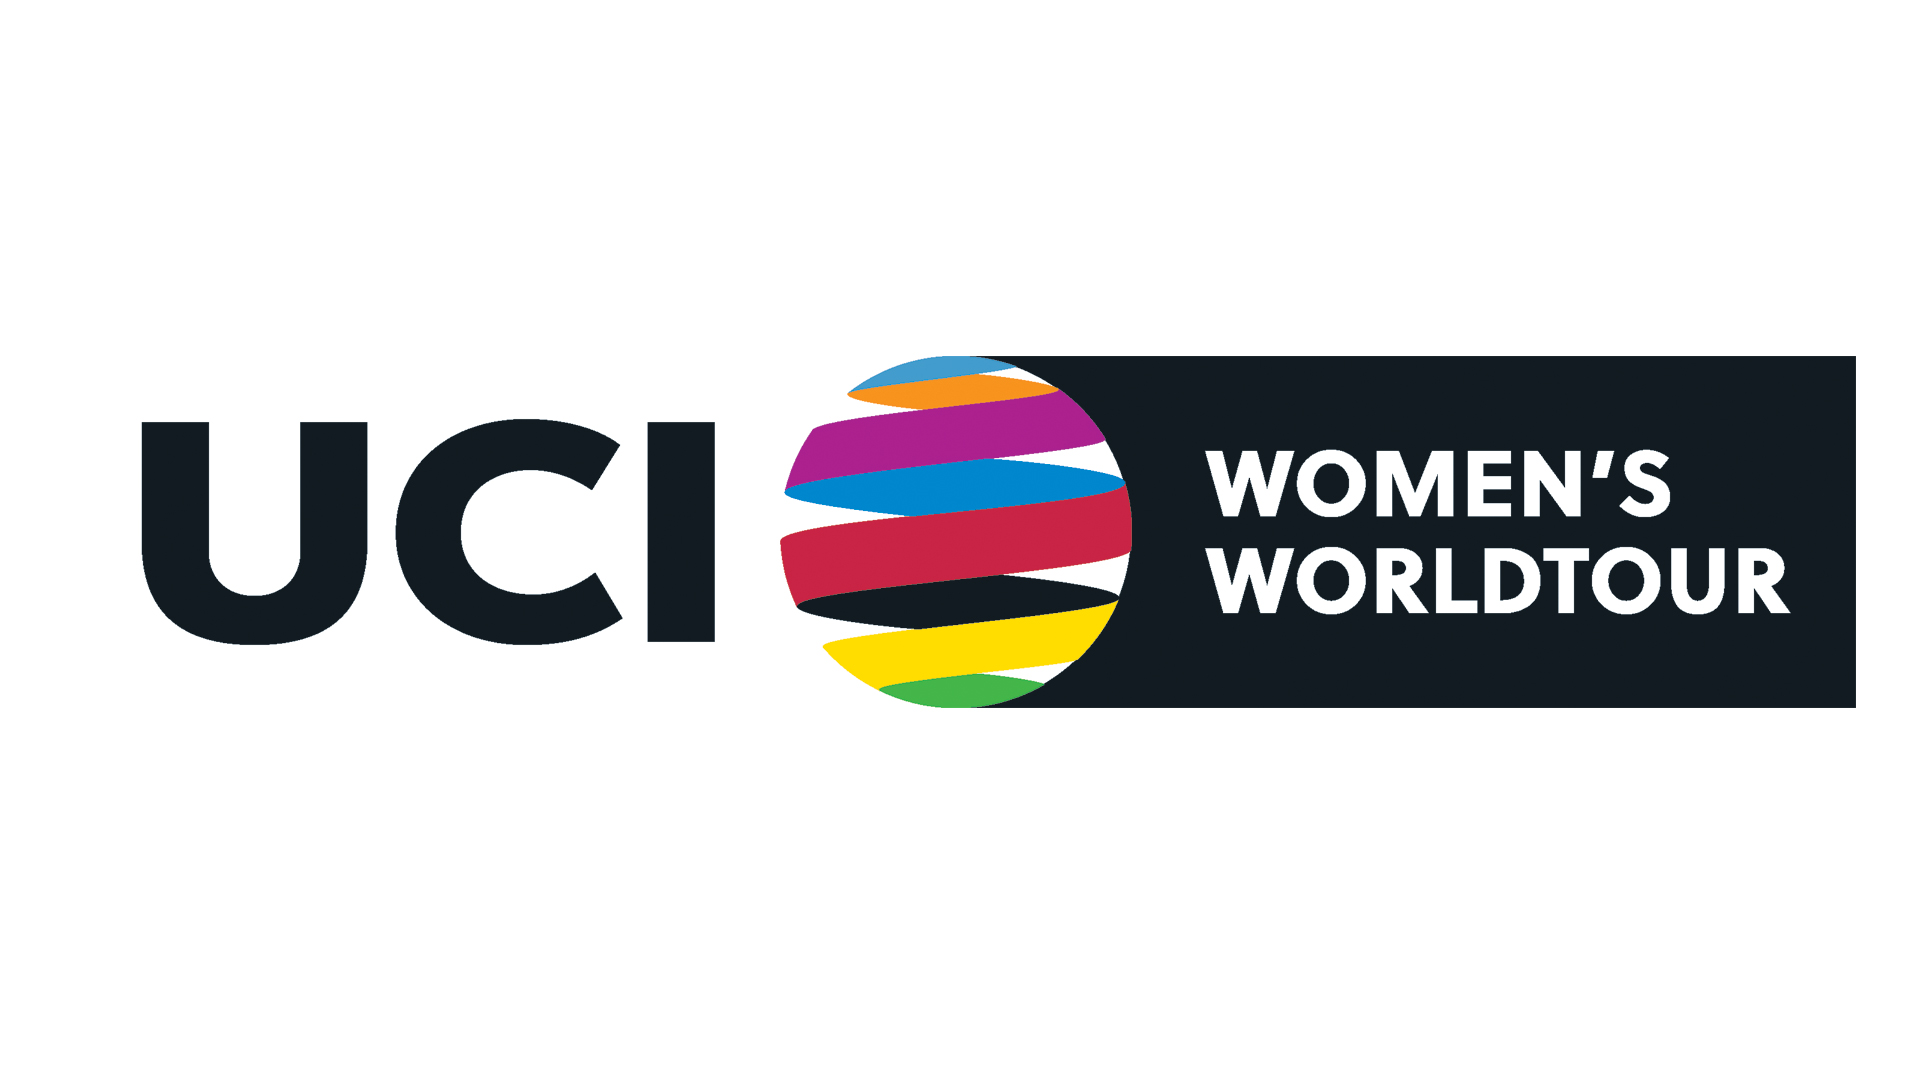 UCI reveals new Women's WorldTour logo for 2016